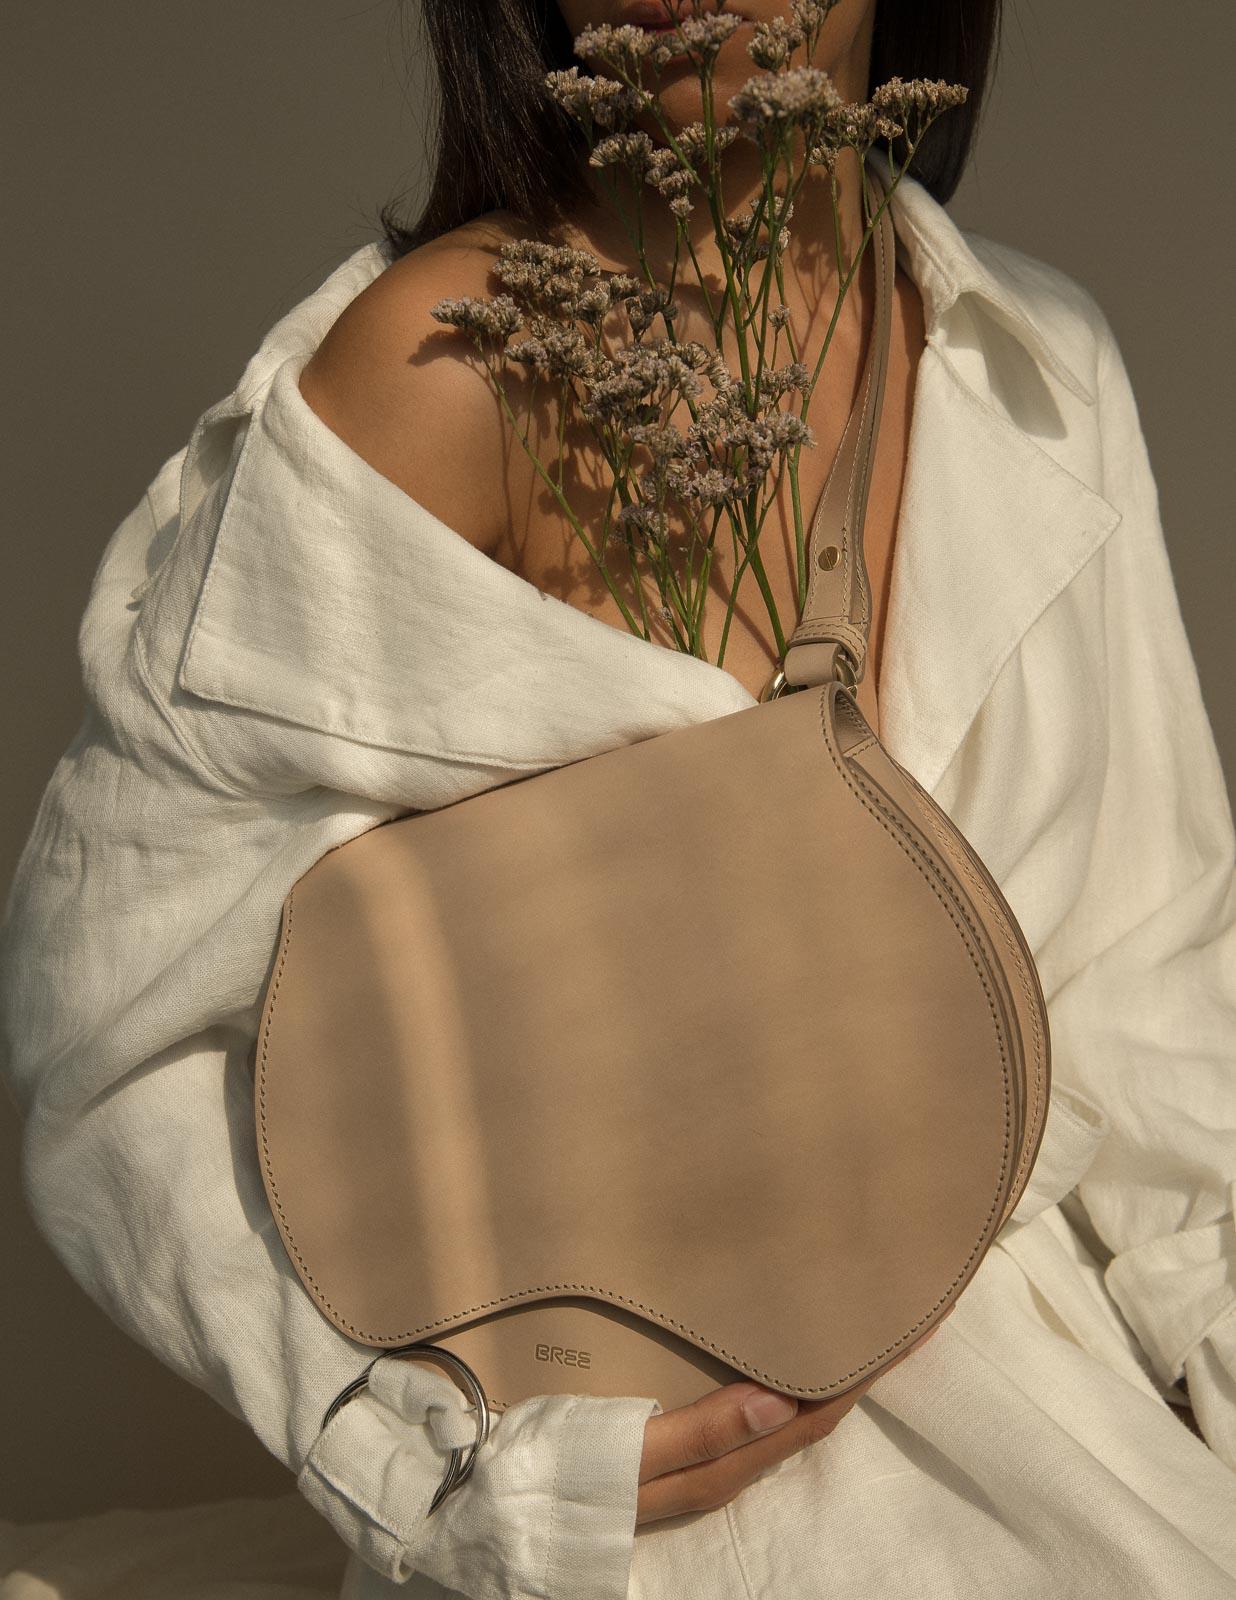 groß auswahl Sonderrabatt große Vielfalt Modelle BREE NATURE BEAUTY – Stormwes – Berlin Fashionblog